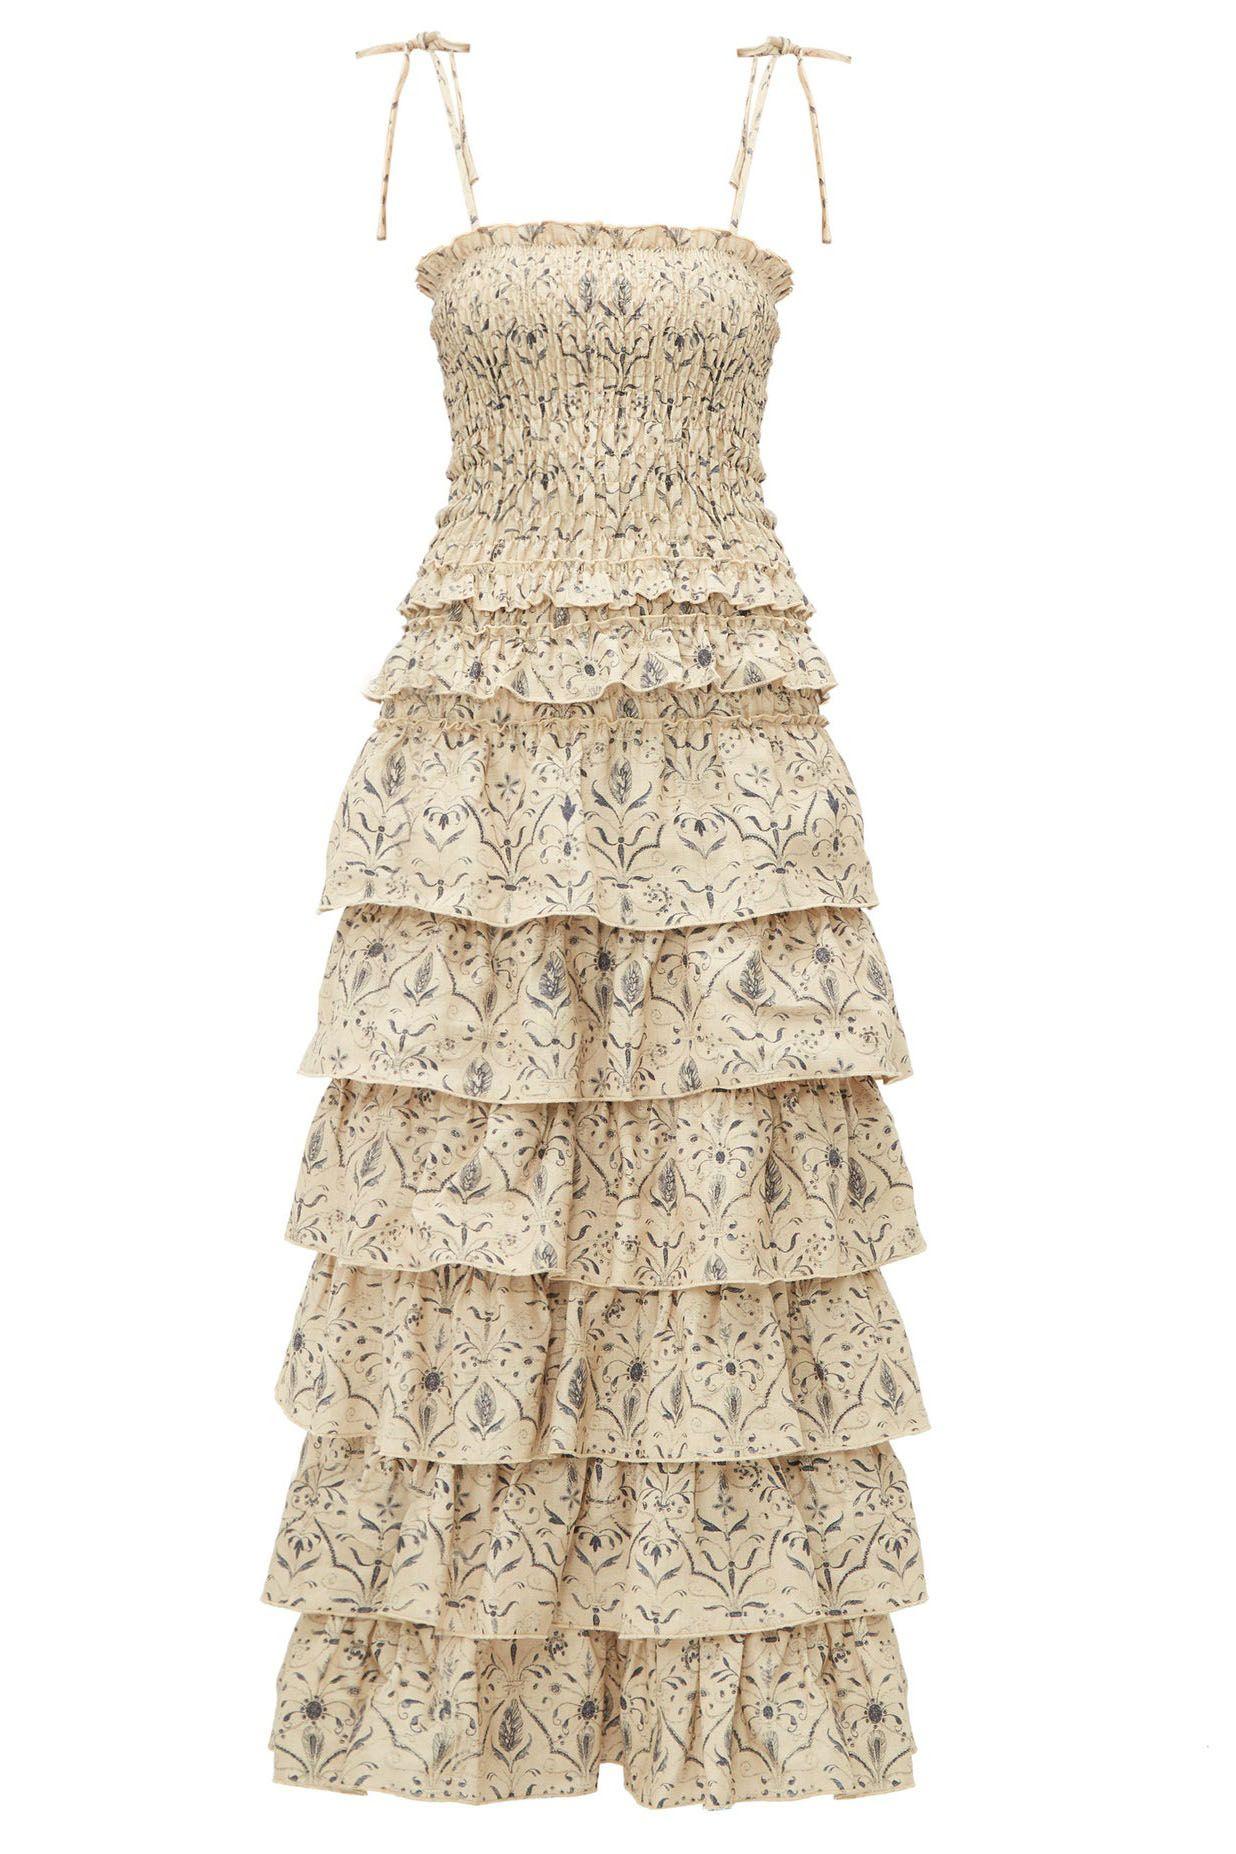 15 best summer dresses of 2019 Stylish maxi dresses